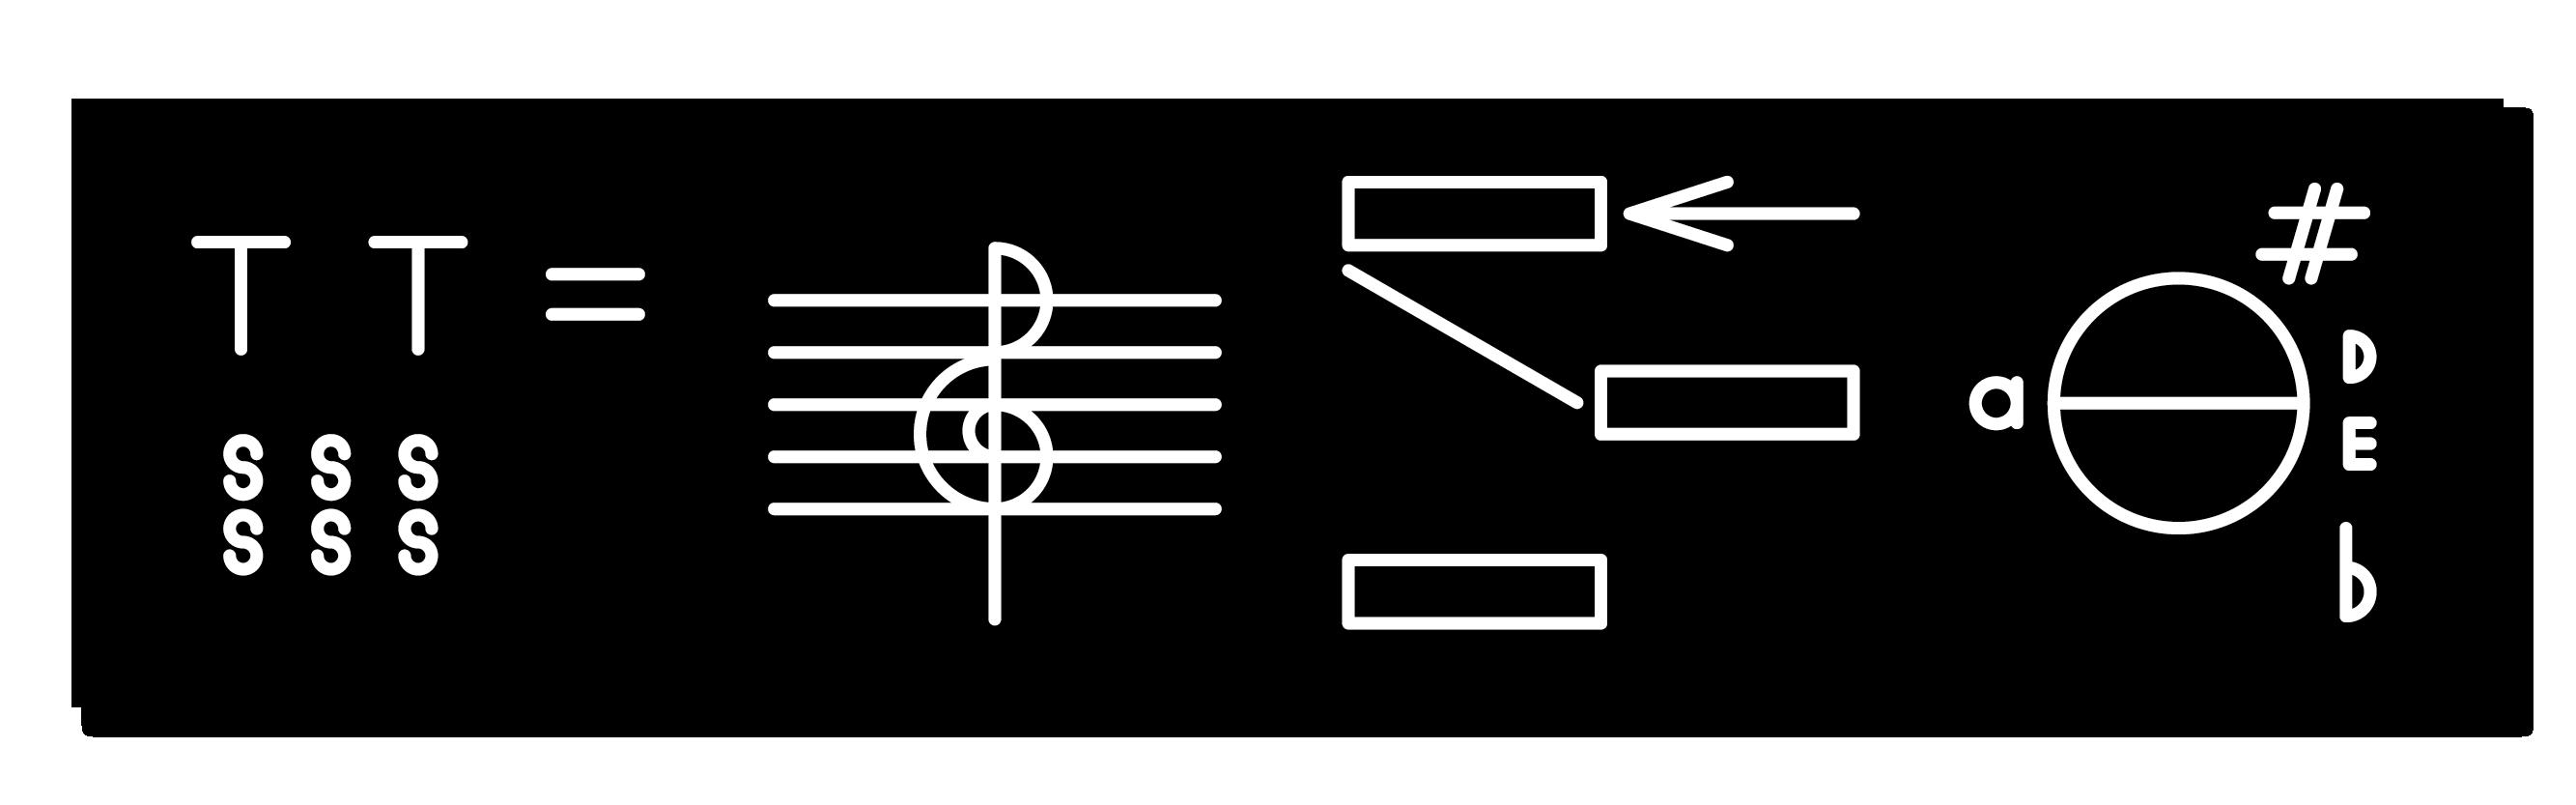 Dante Carlos, *Satanic Harmony (A♮ +  D ♯ / E ♭ )*, 2015. Engraved plastic, 2 x 8 inches (5 x 20.32 cm)